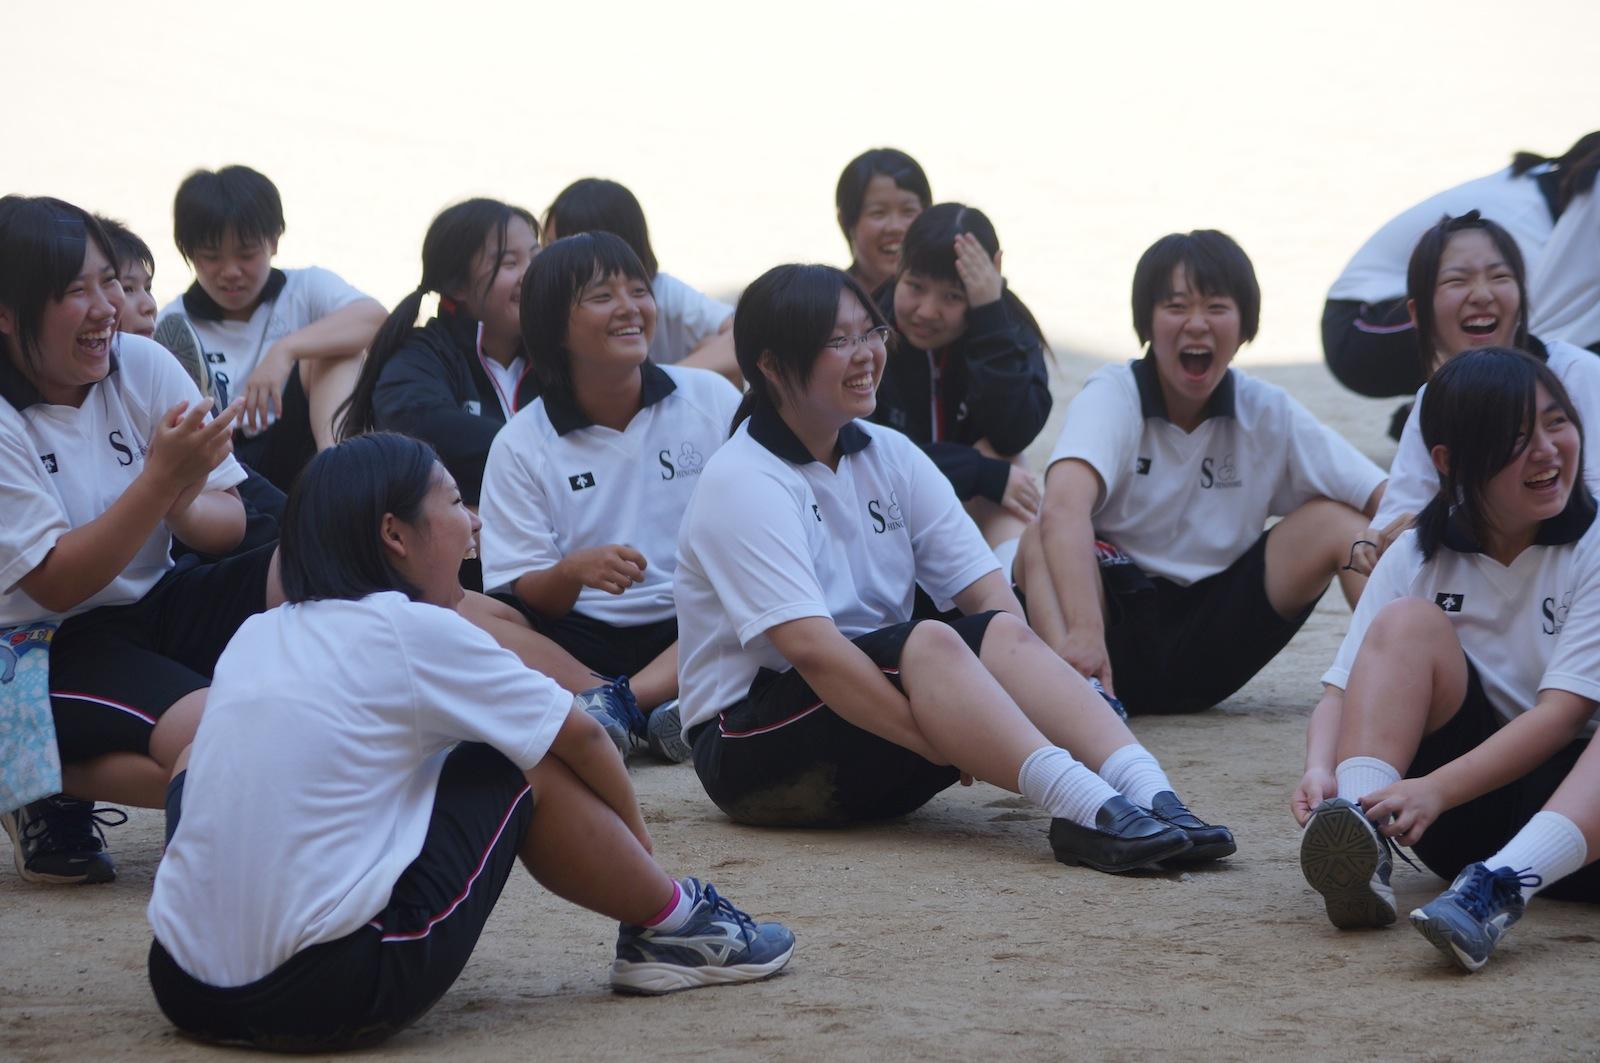 応援合戦の練習!: 今日の東雲 : 英語で中学生 : 中学